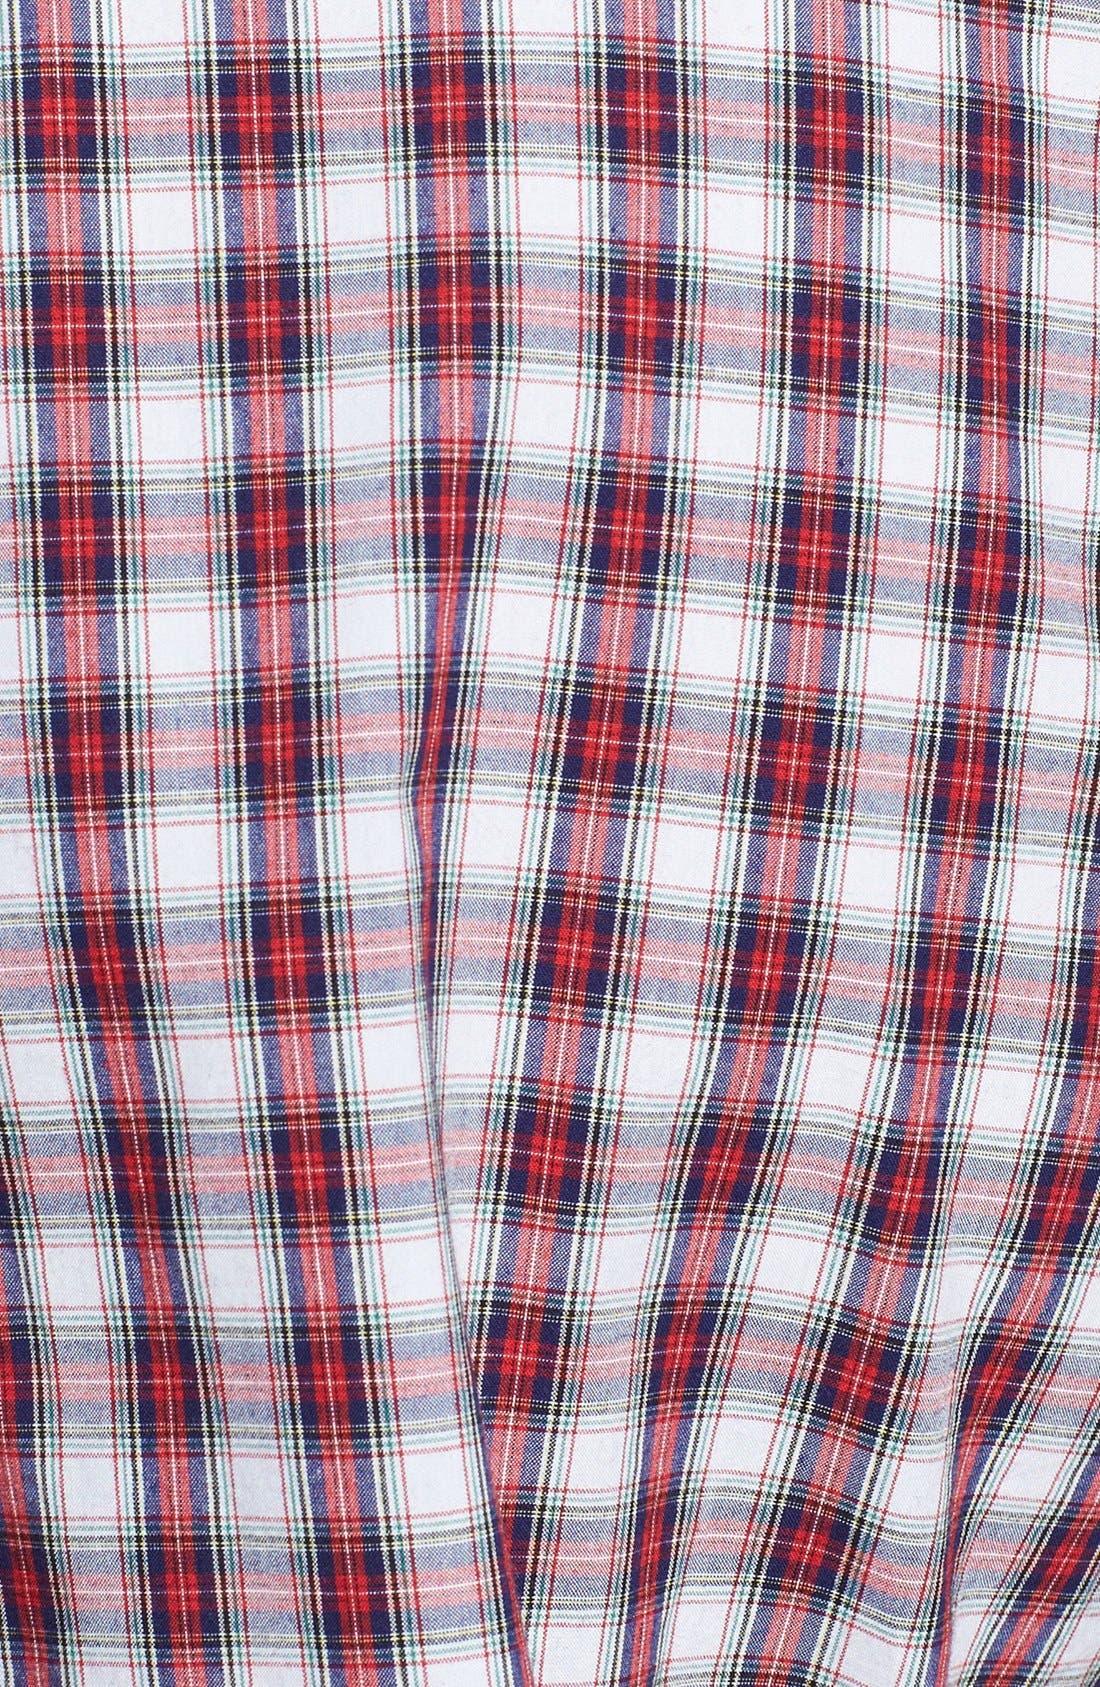 Alternate Image 3  - Jack Spade 'Hawley' Plaid Shirt